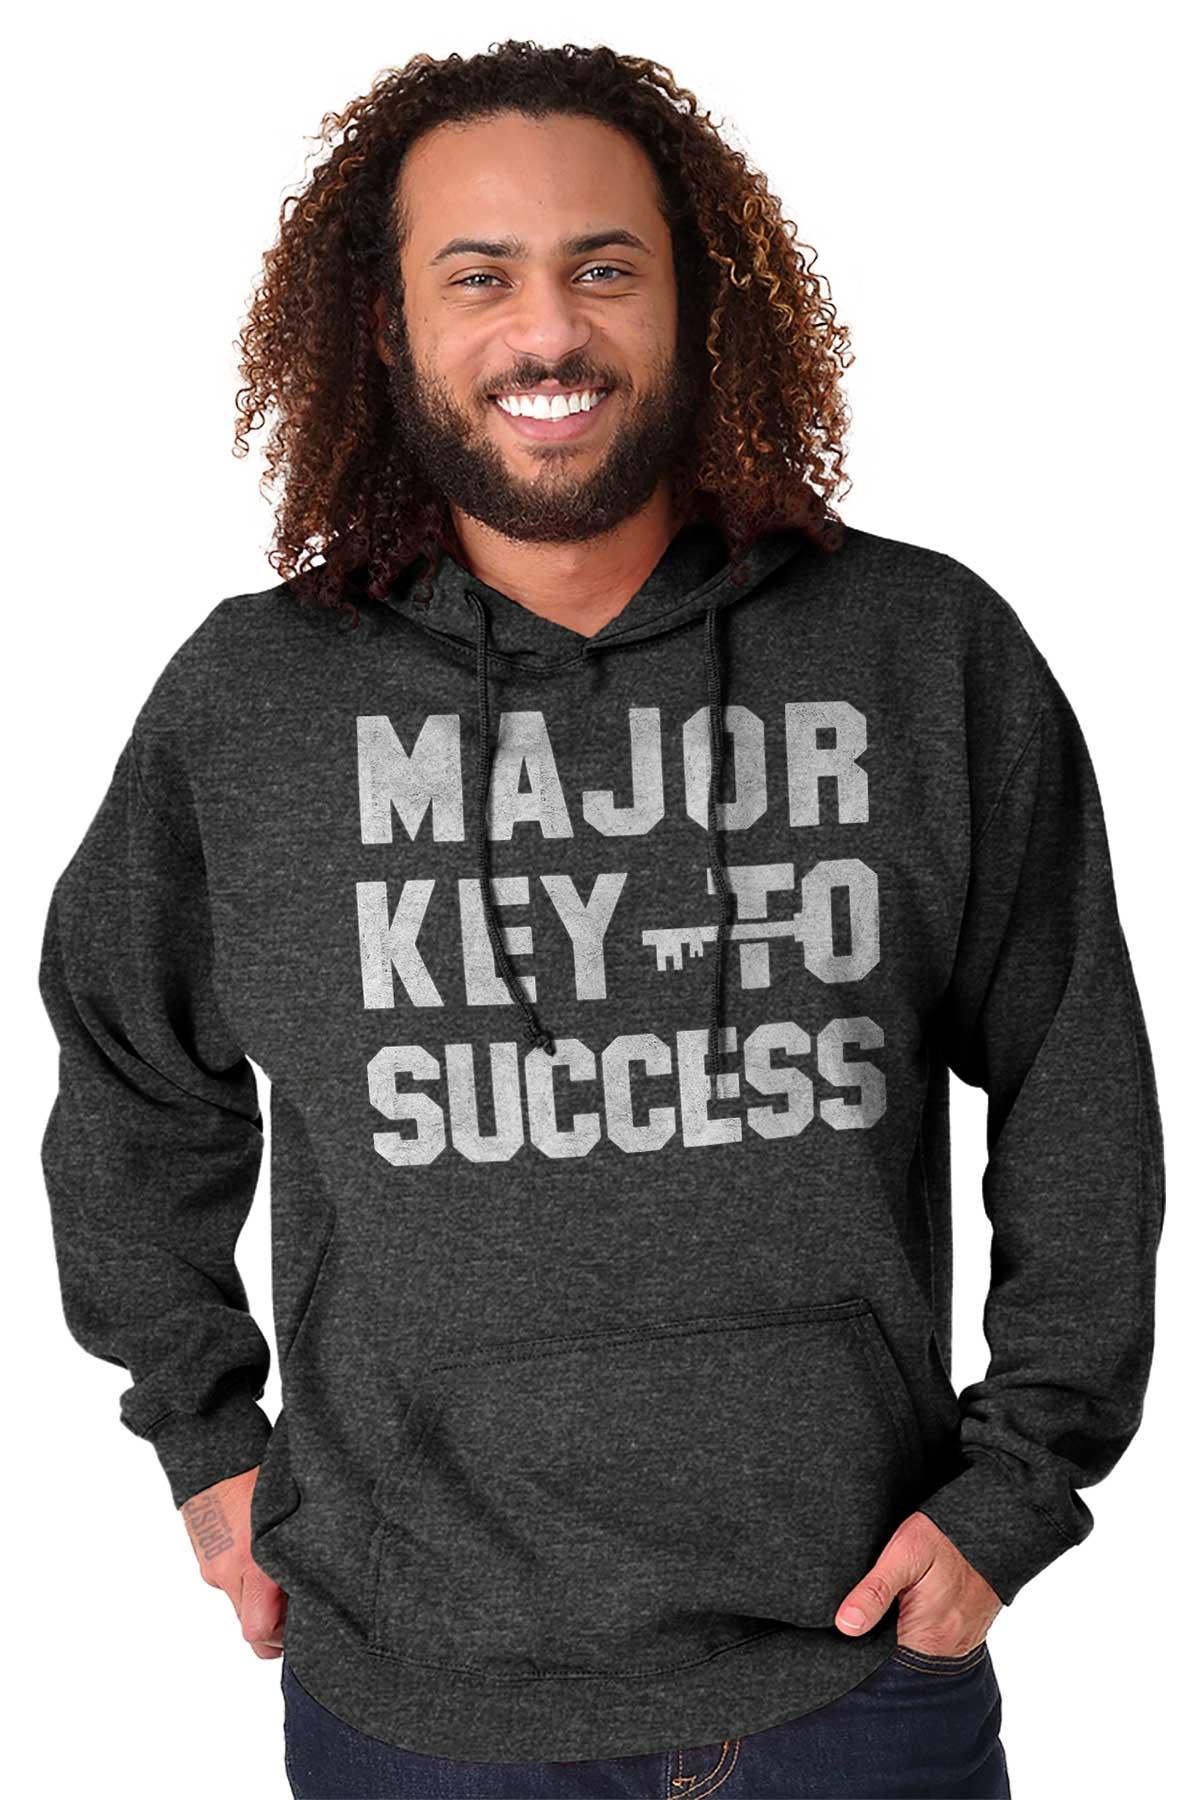 Major Key To Success Funny Hip Hop Rapper Hoodies Sweat Shirts Sweatshirts Ebay